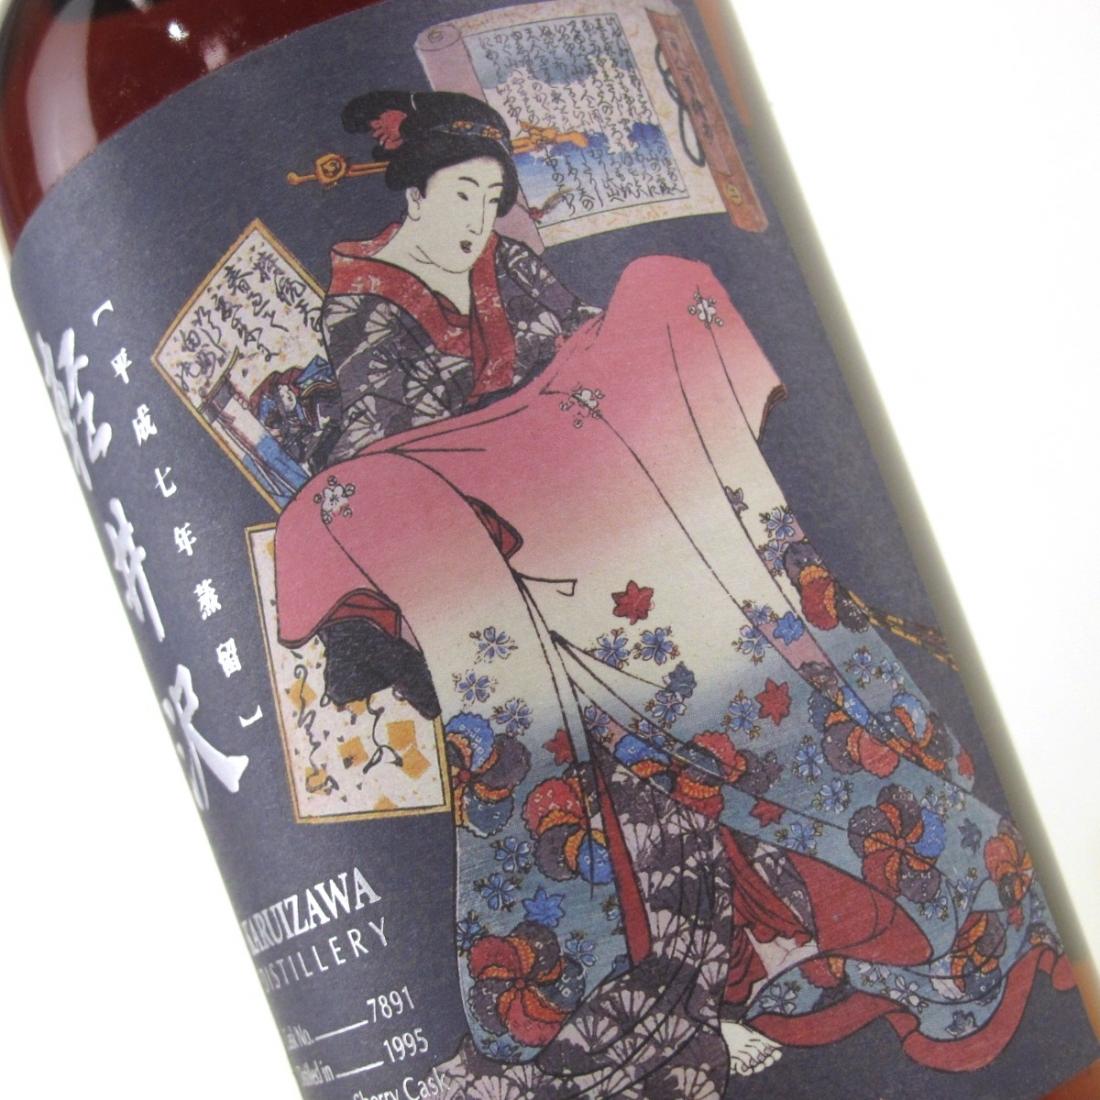 Karuizawa 1995 Single Cask #7891 / Geisha Label